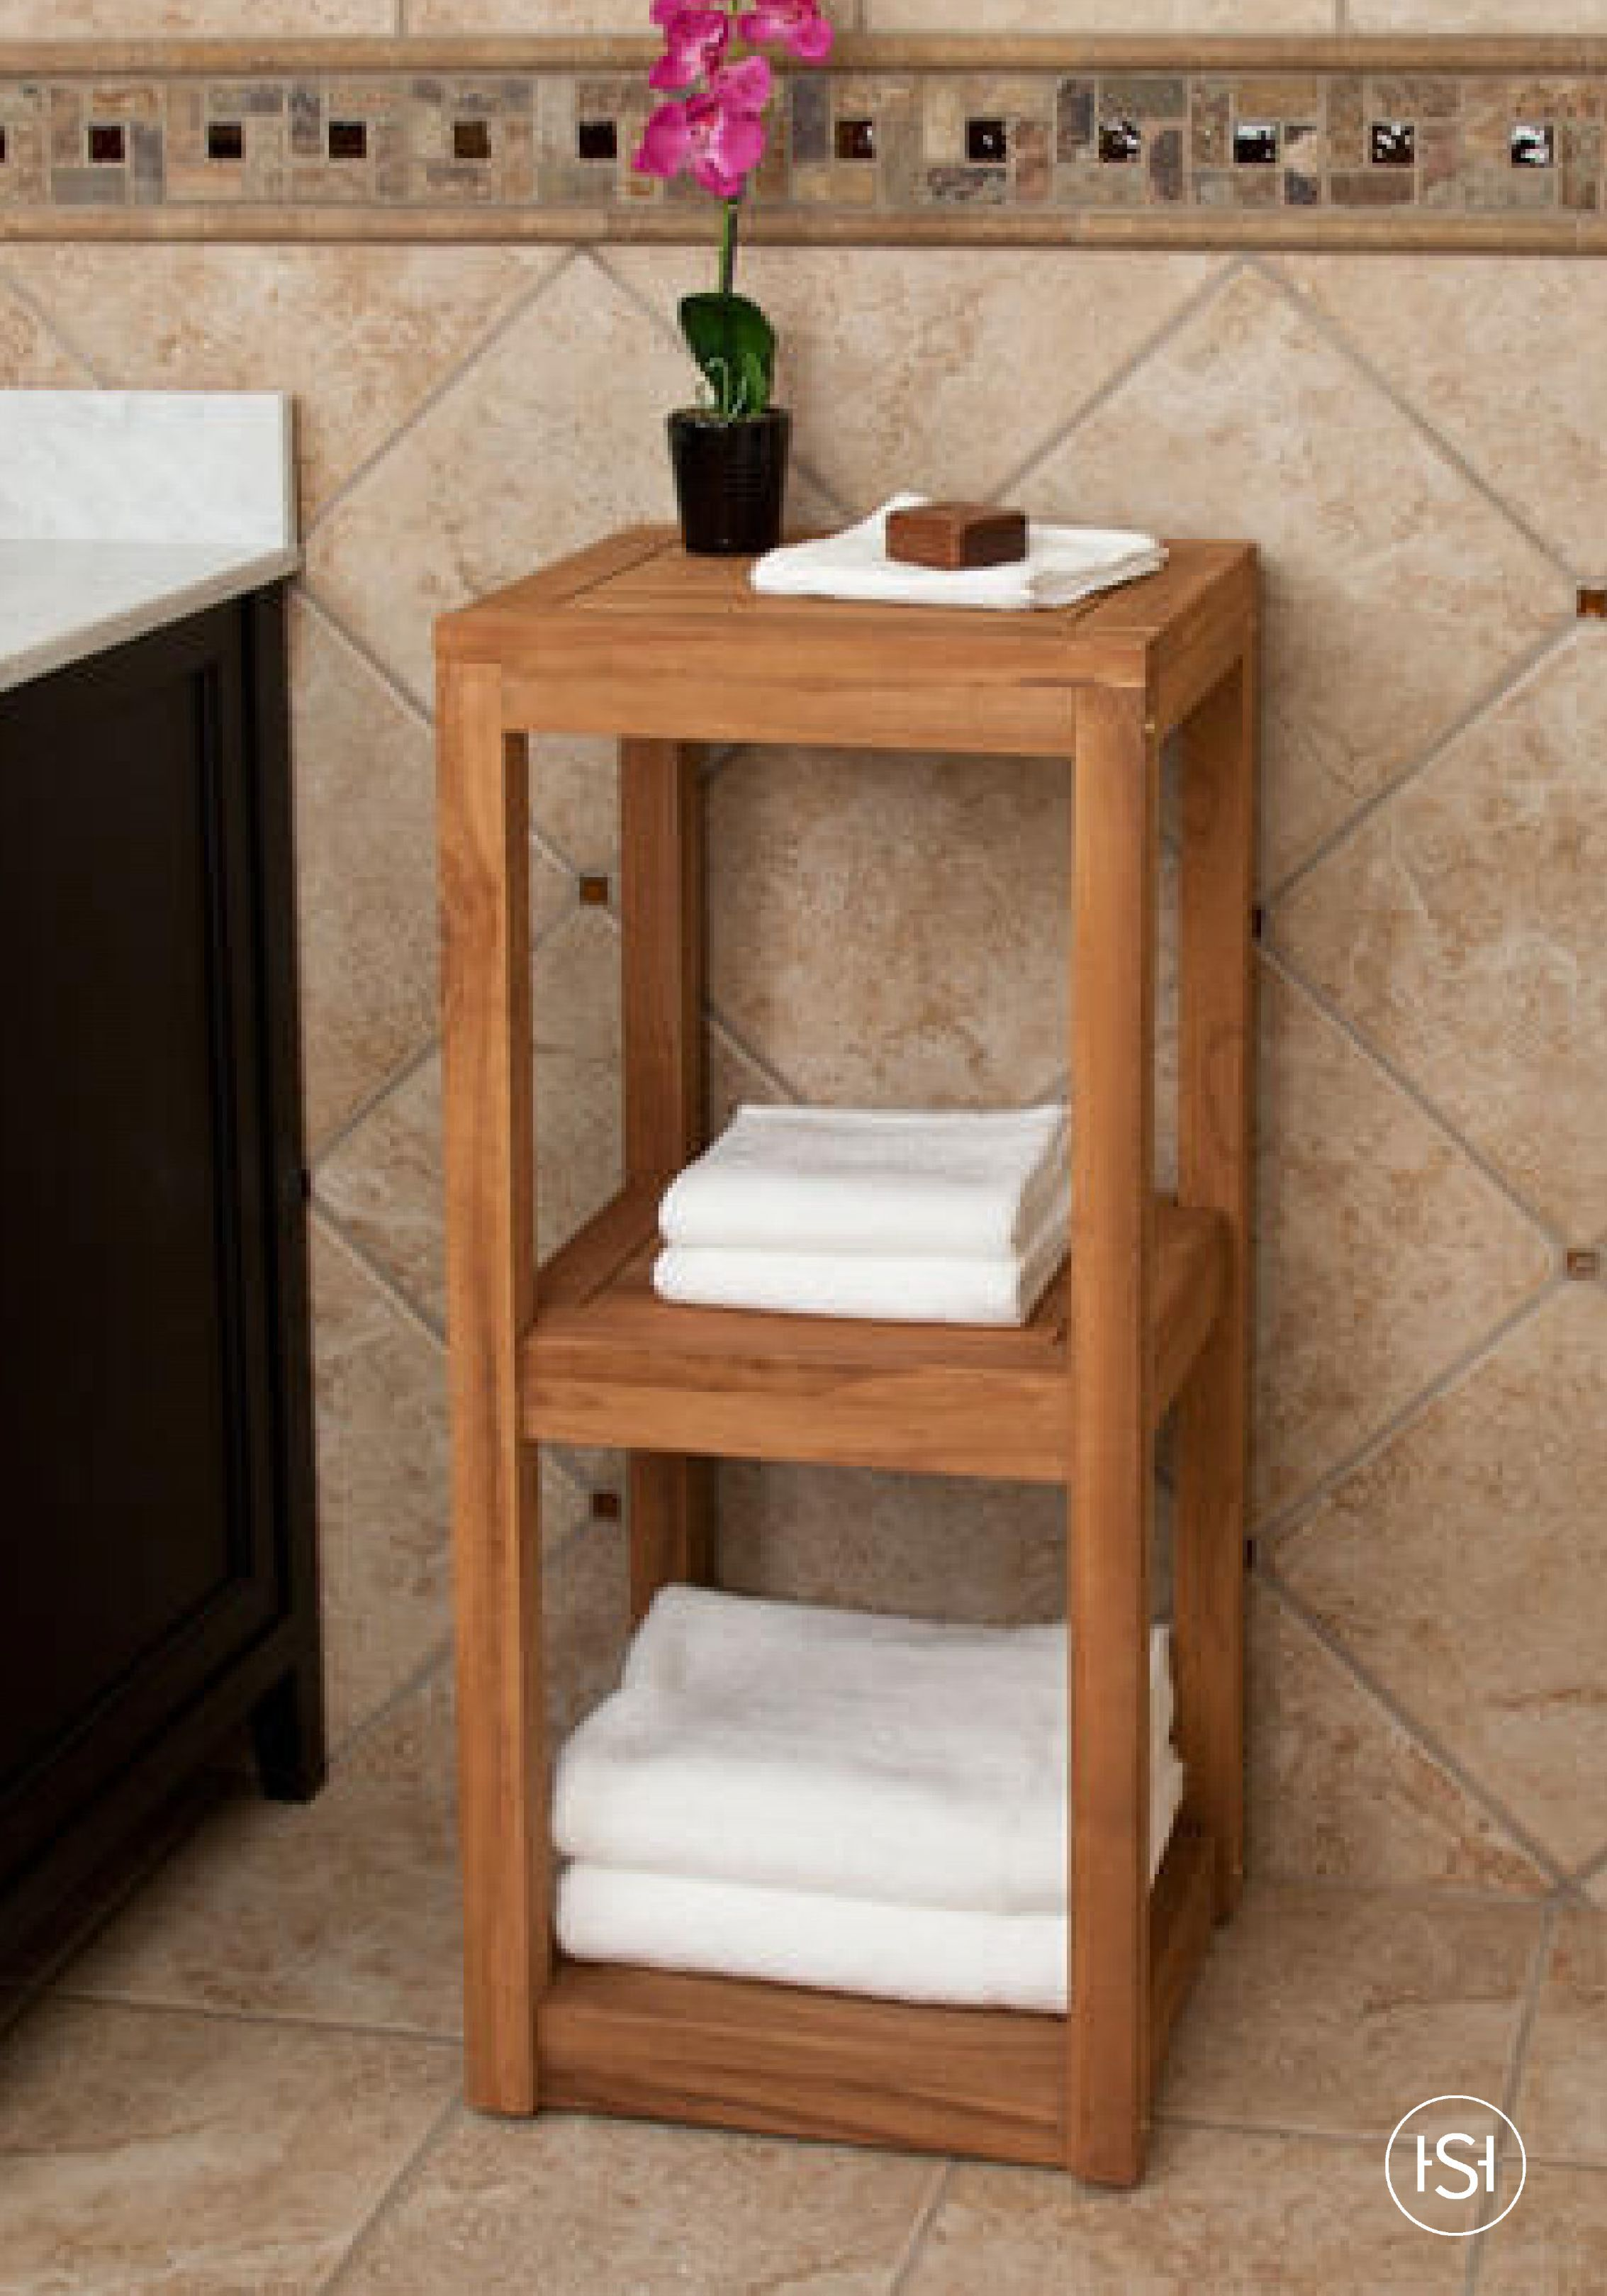 Three Tier Teak Towel Shelf Teak Bathroom Towel Shelf and Teak Wood